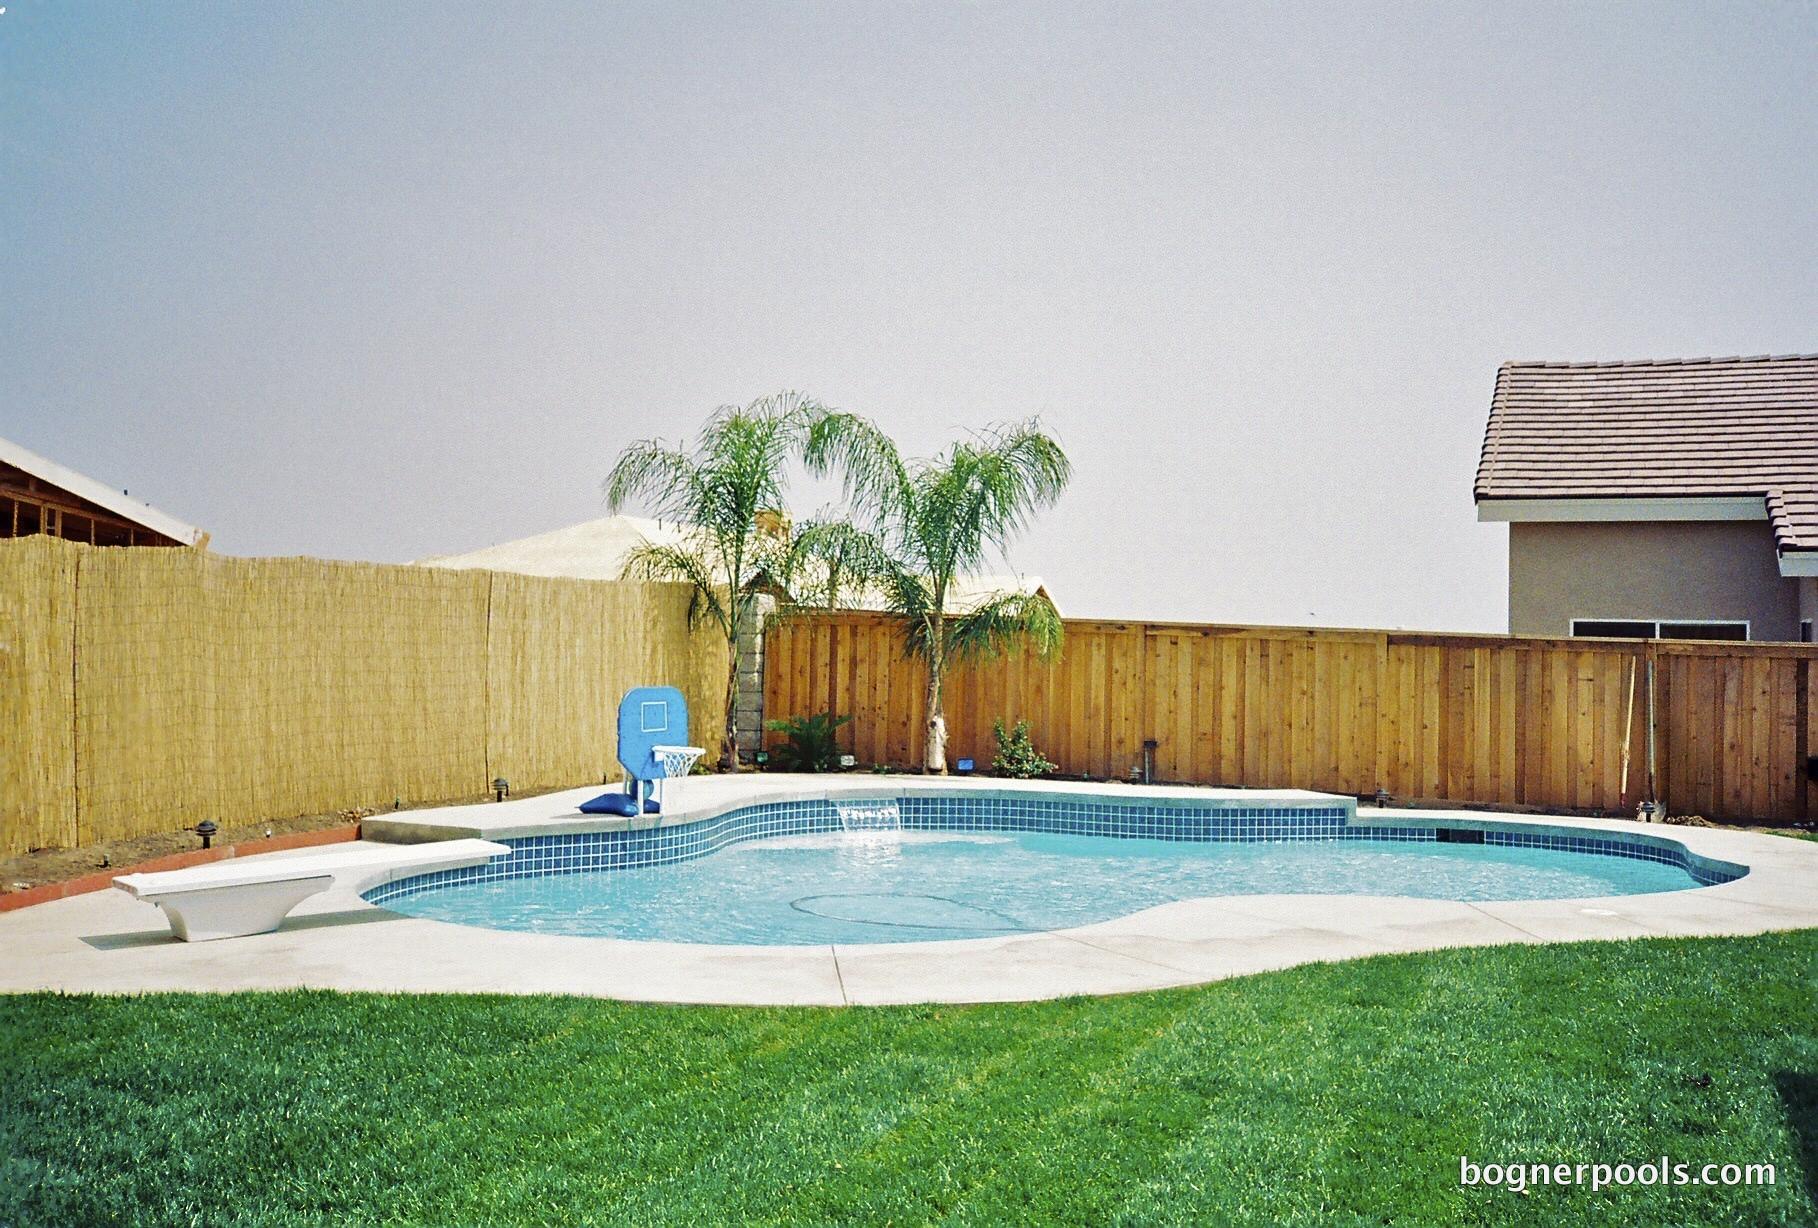 Pool%2520Only-6_2.jpg